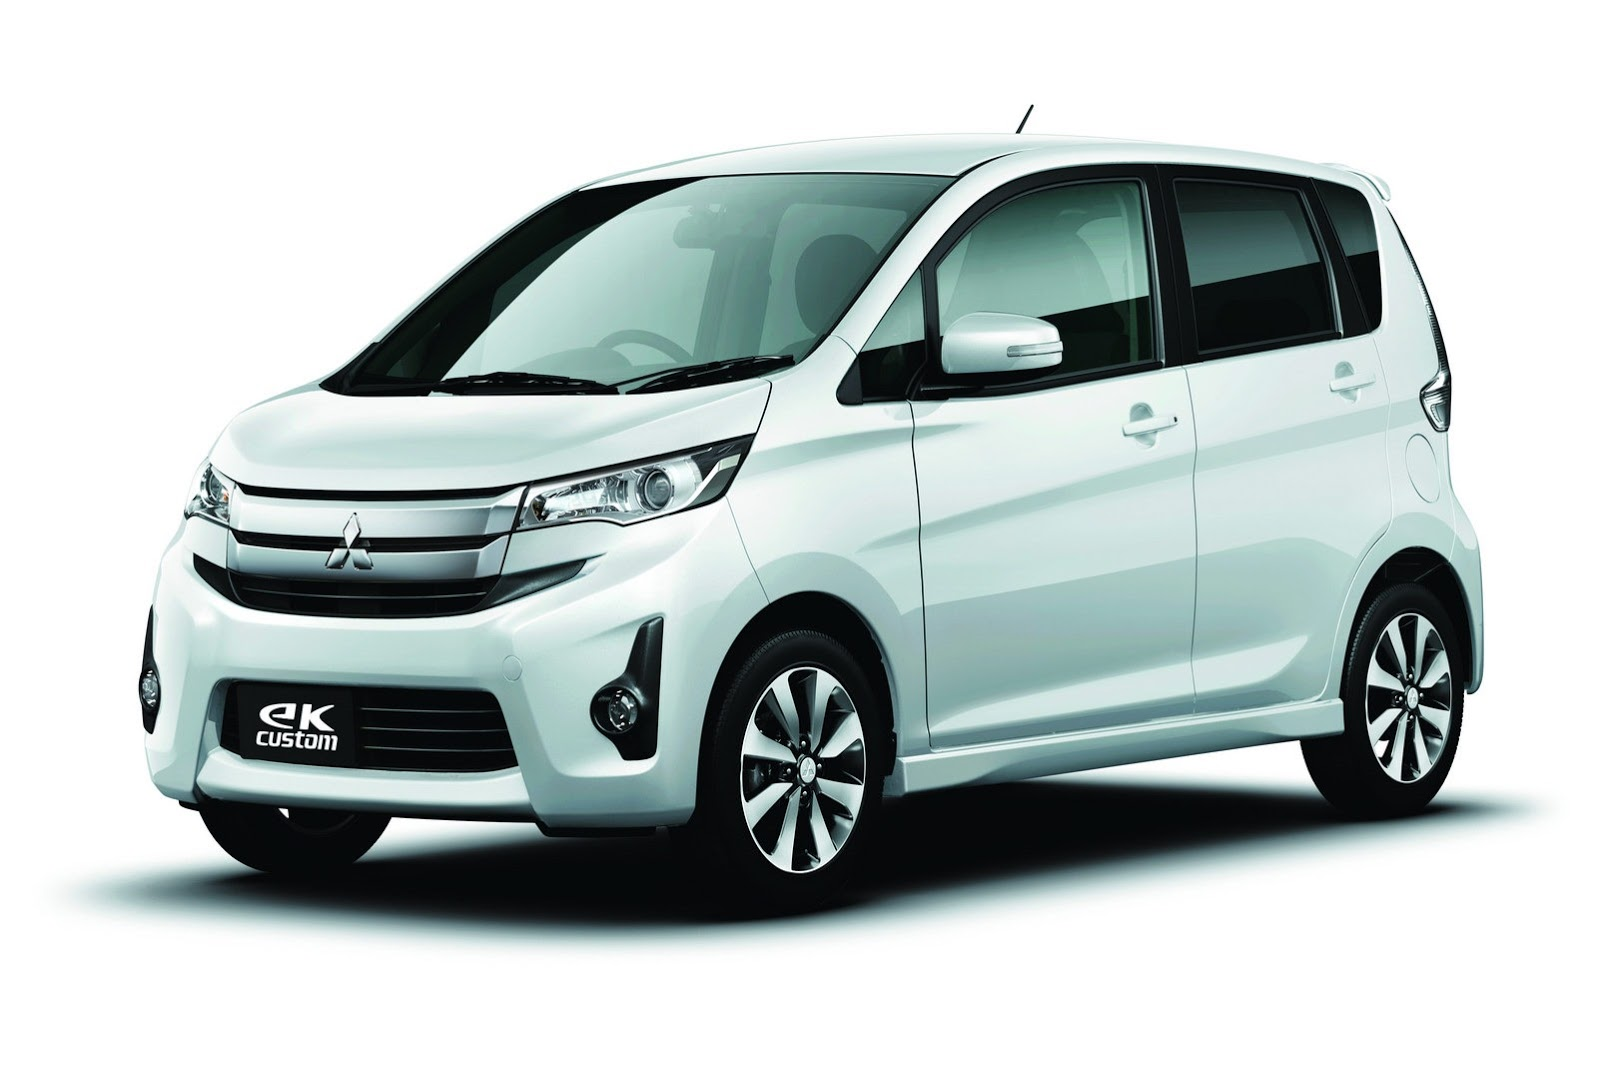 Mitsubishi eK Custom I 2013 - 2015 Hatchback 5 door #7